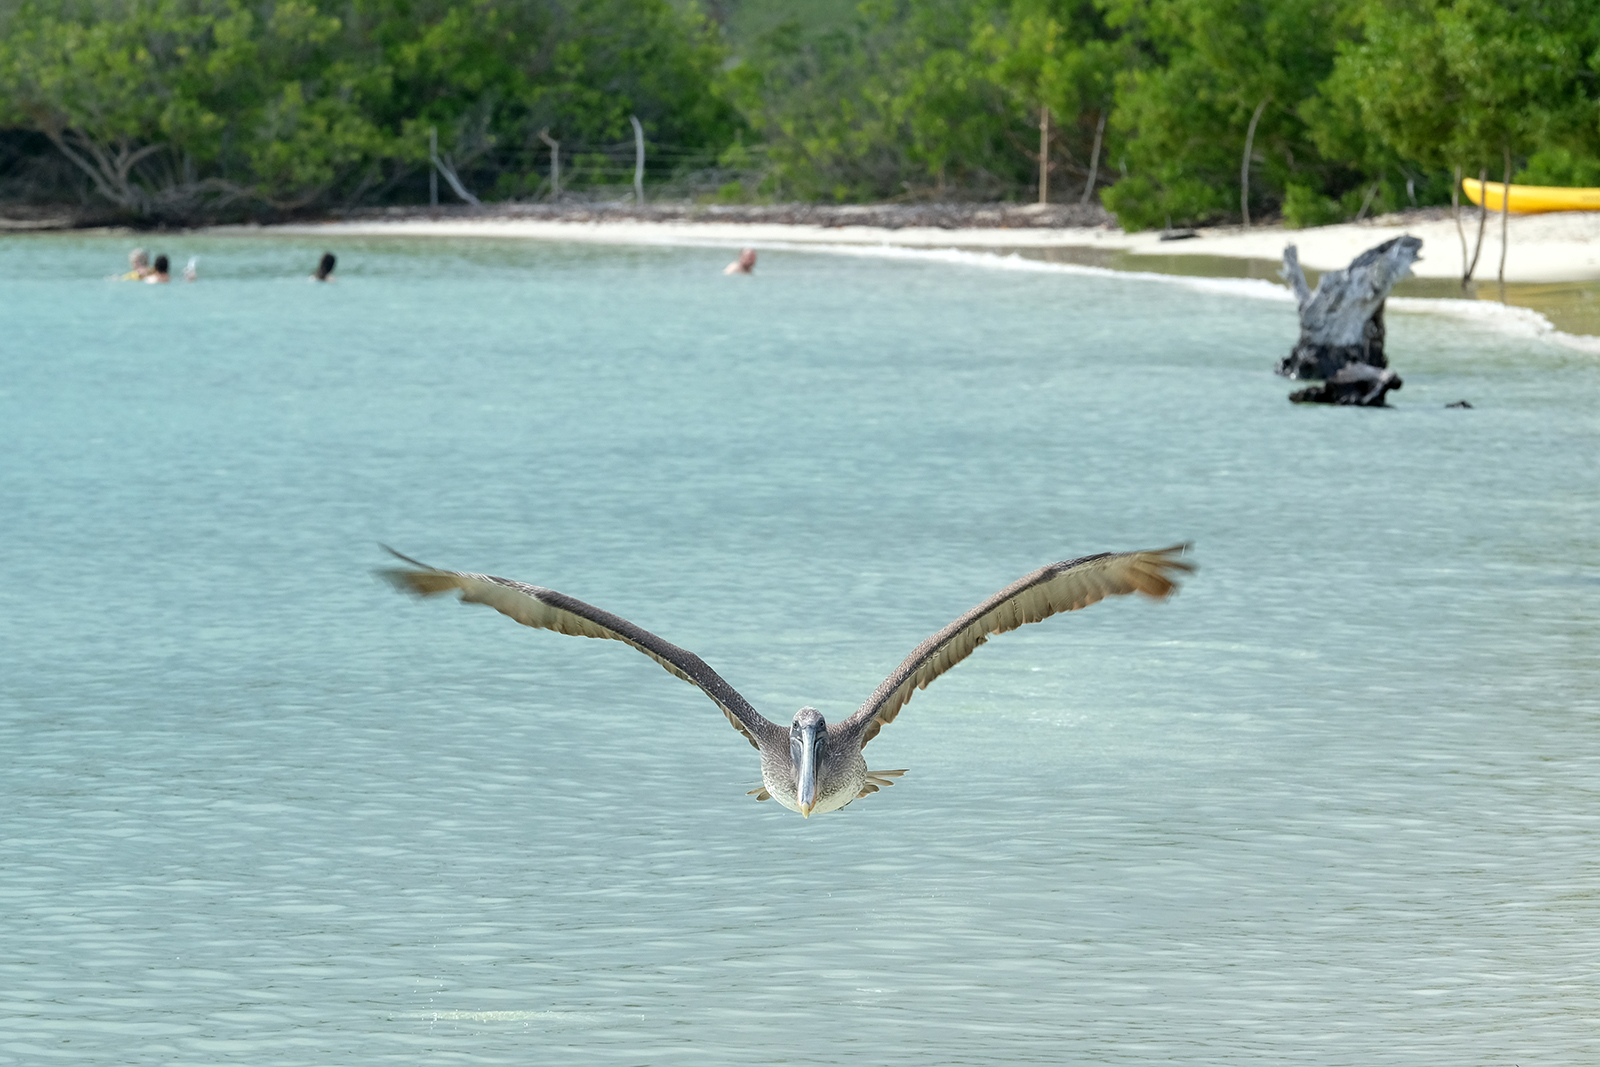 04_Playa_Bahia_de_Tortuga_04_pelicano.JPG